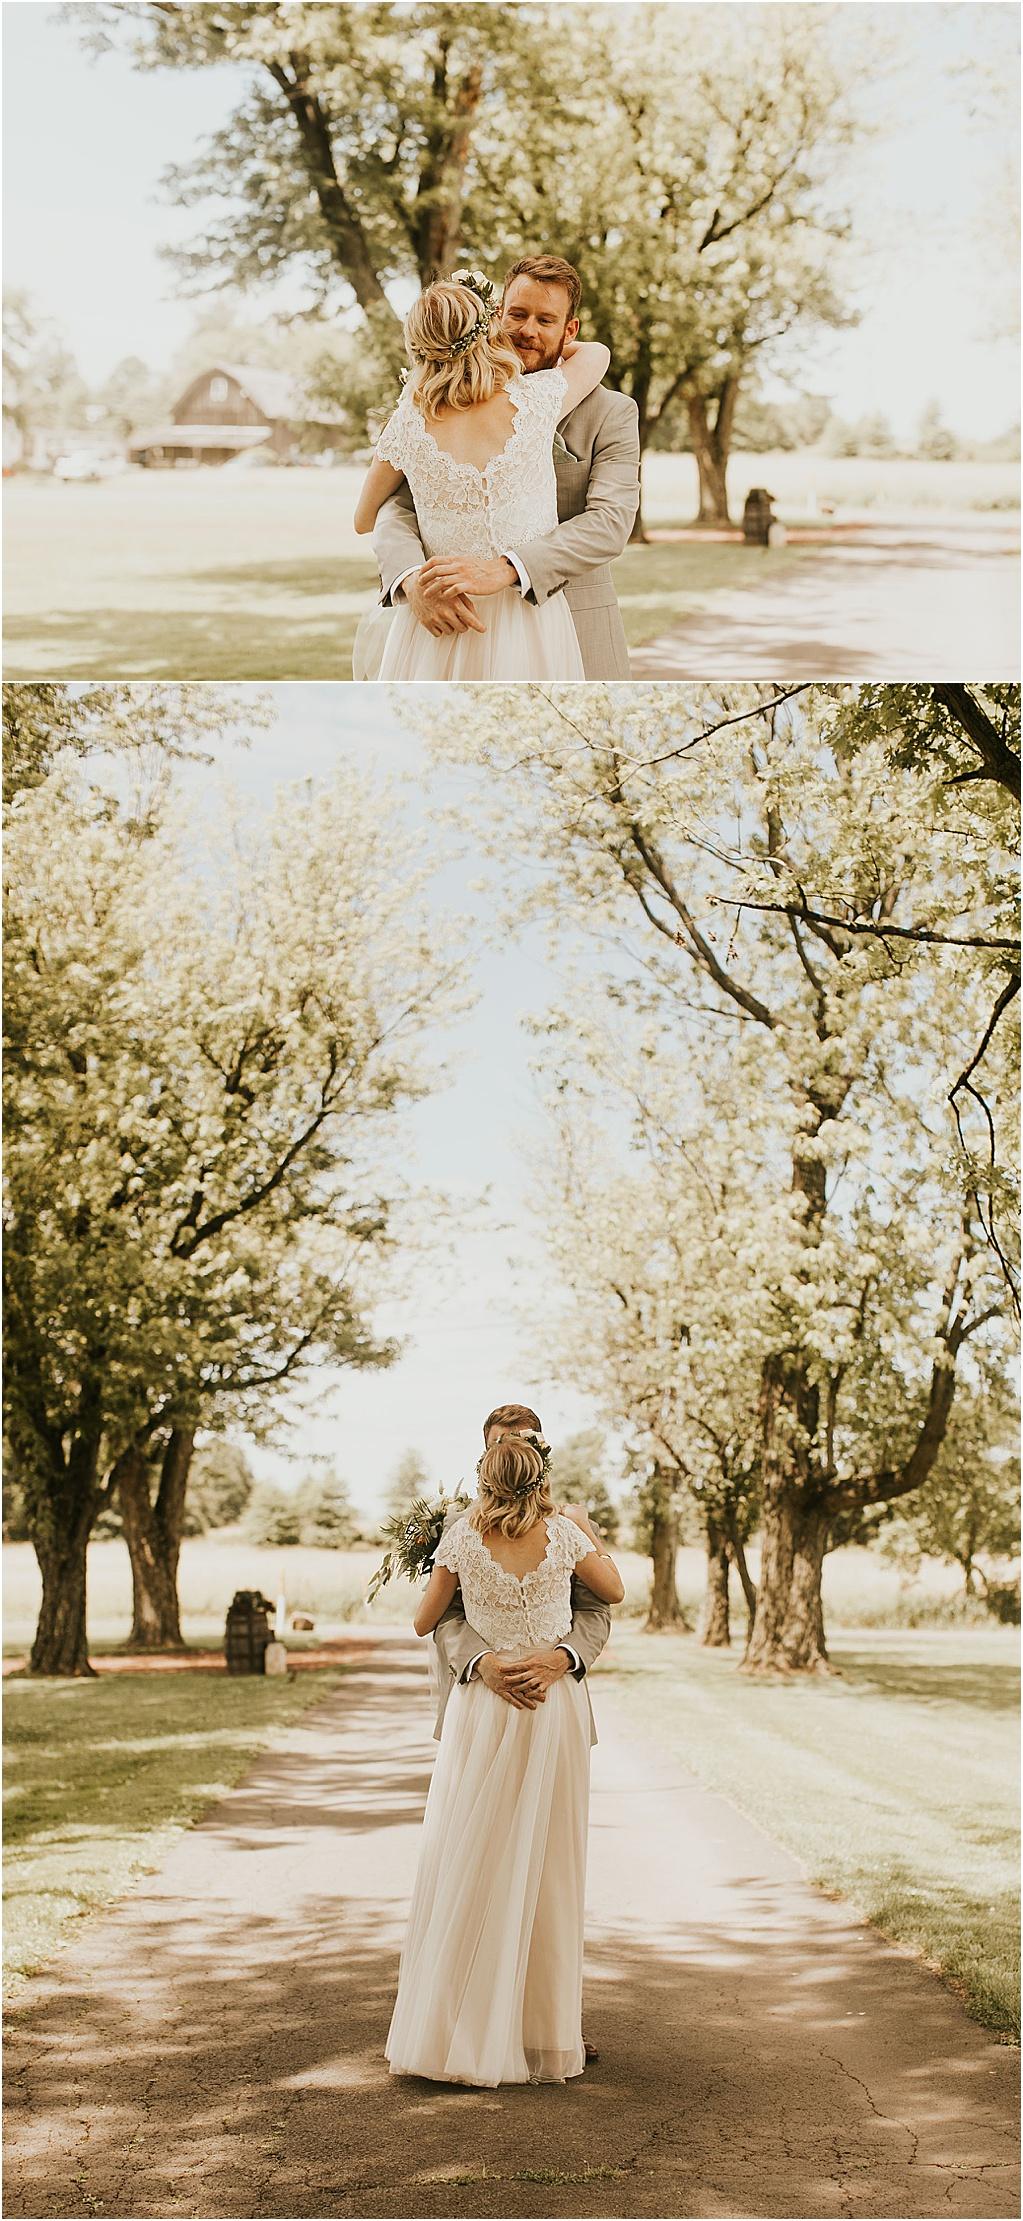 brittany_boote_pennsylvania_wedding_photographer_0435.jpg